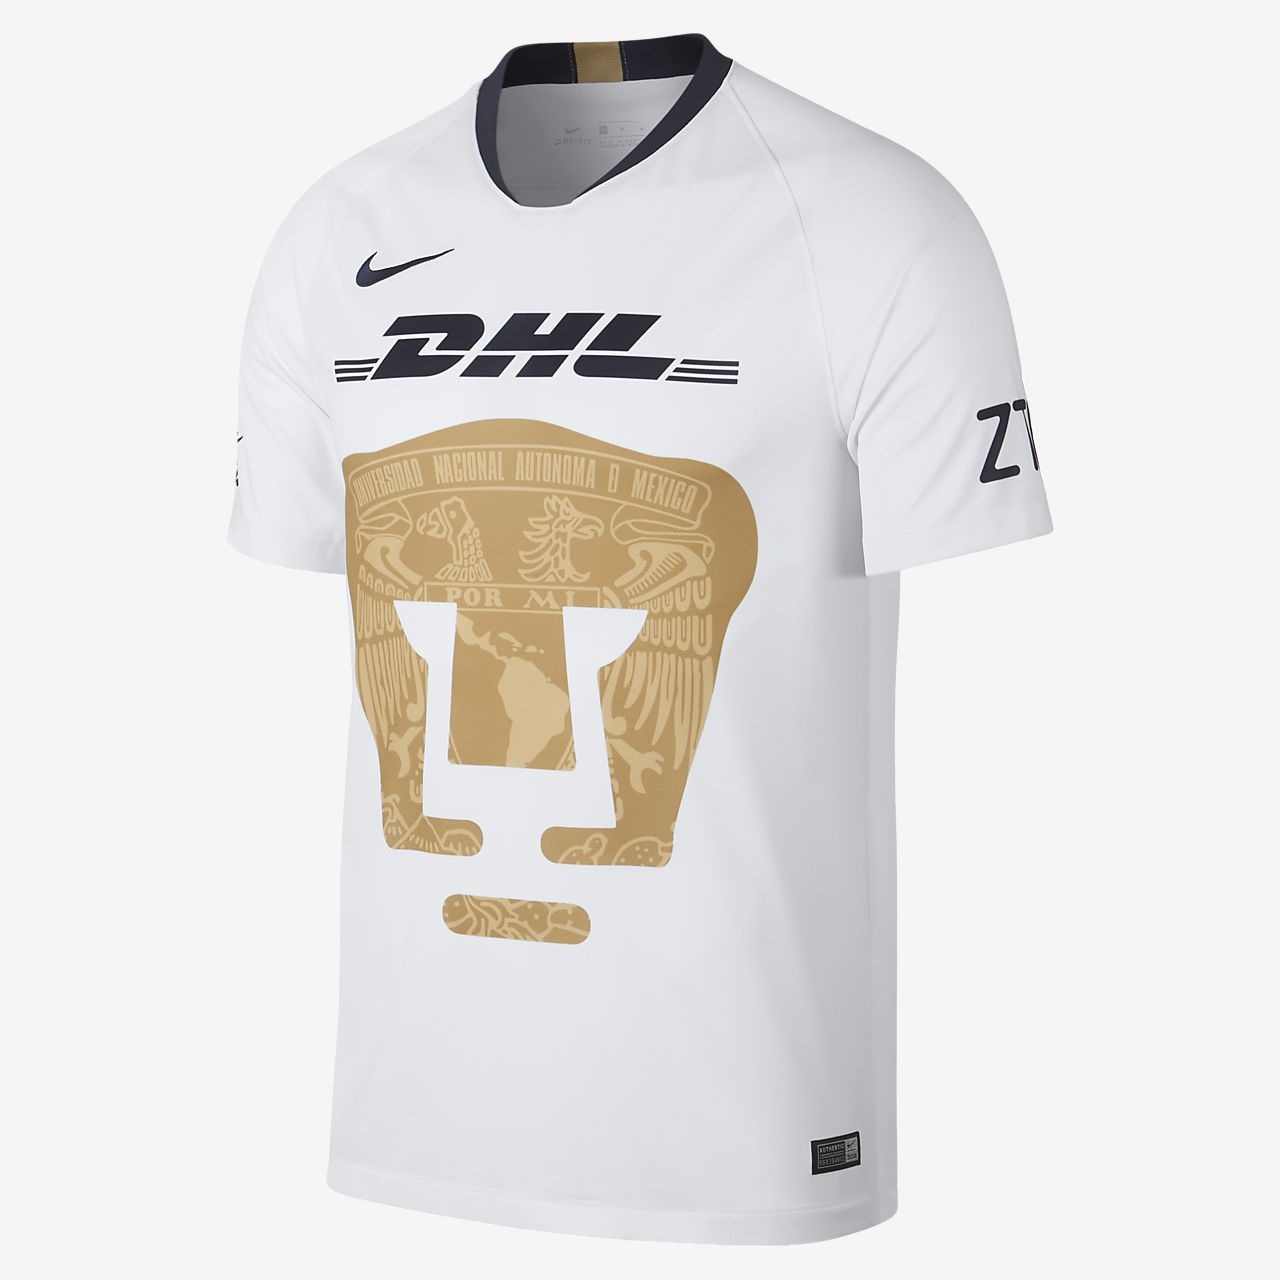 995bbcd0f41 2018 19 Pumas UNAM Stadium Home Men s Soccer Jersey. Nike.com